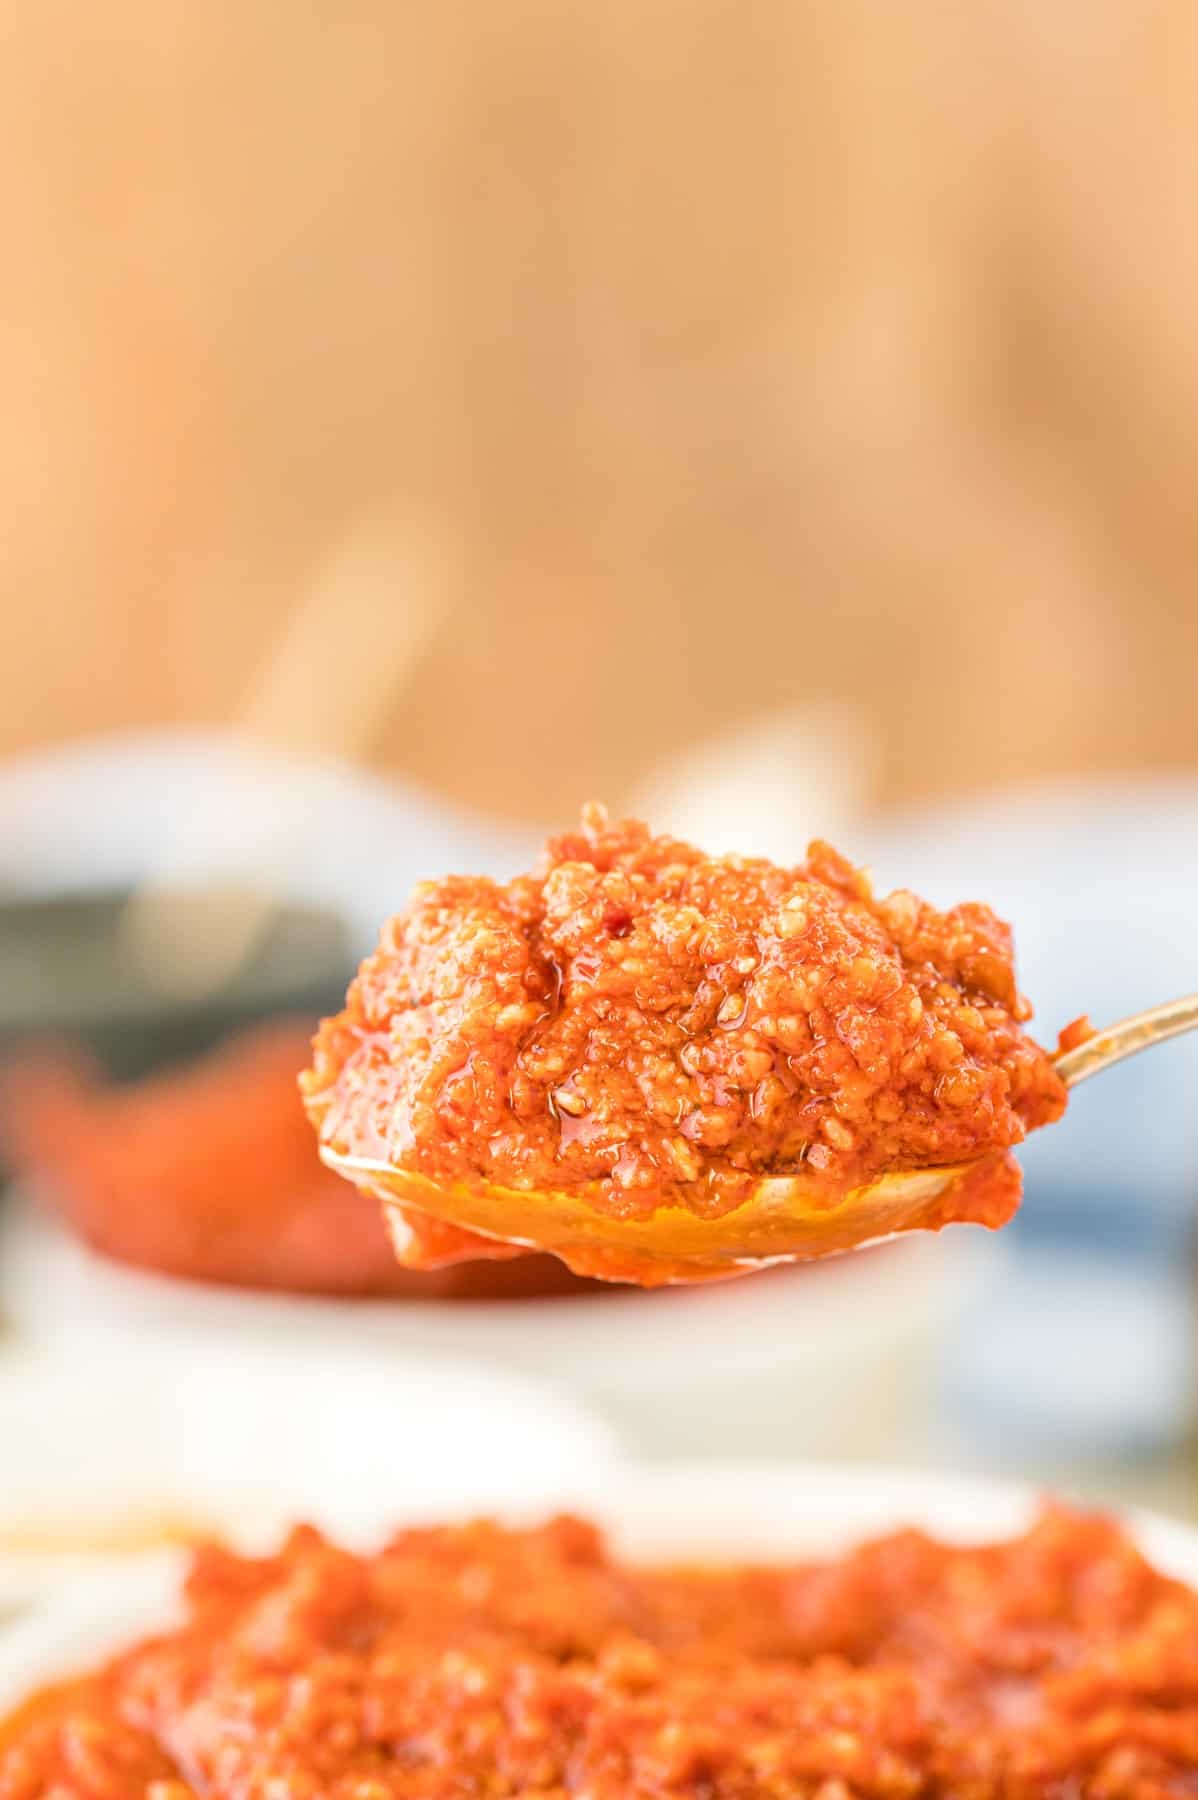 Spoonful of Pesto Rosso